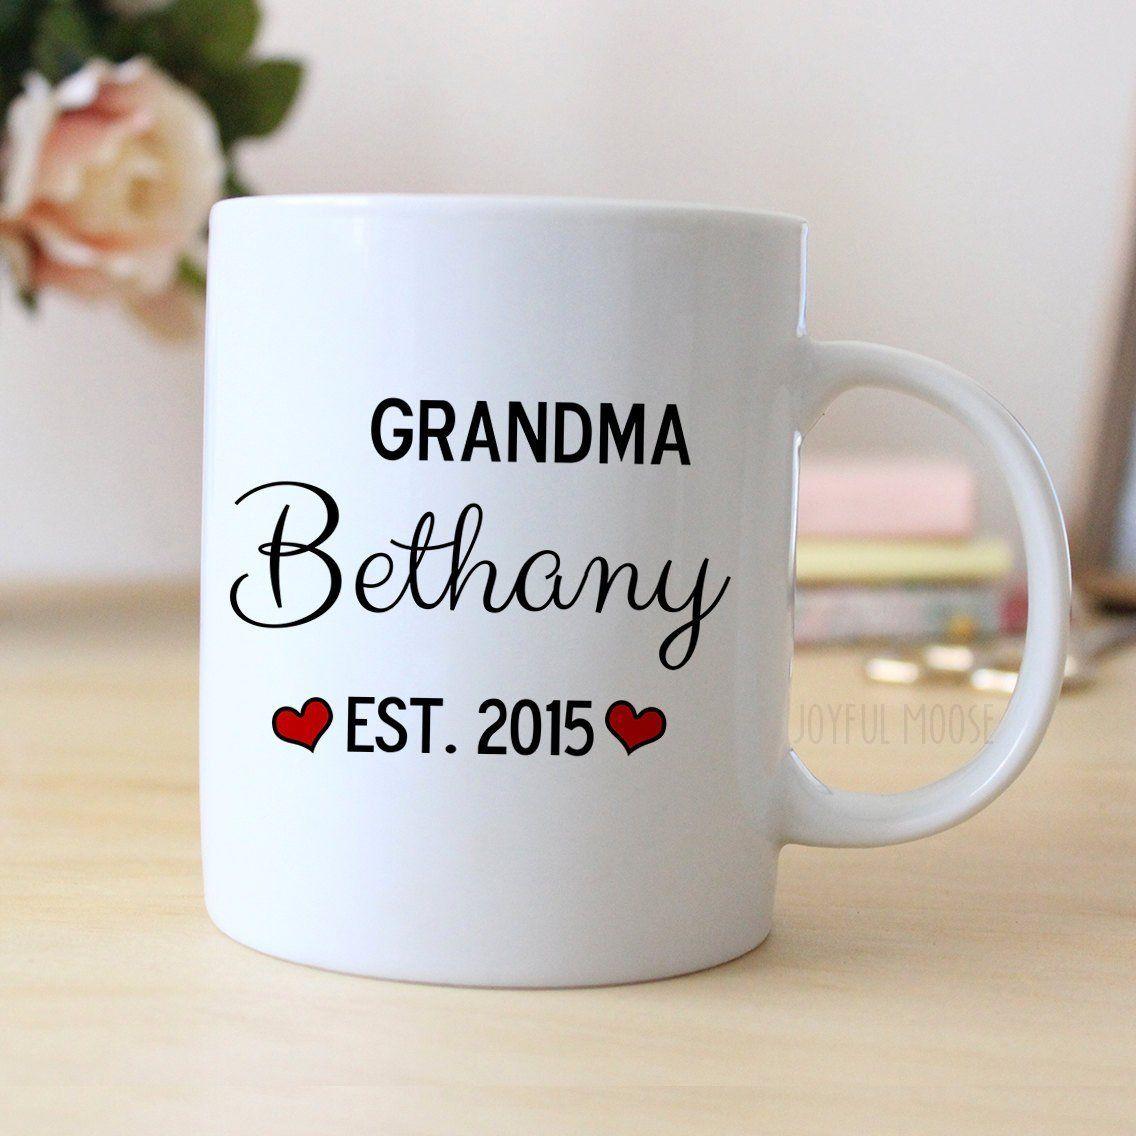 Grandma Personalized Mug Personalized Grandma Coffee Mug Grandma